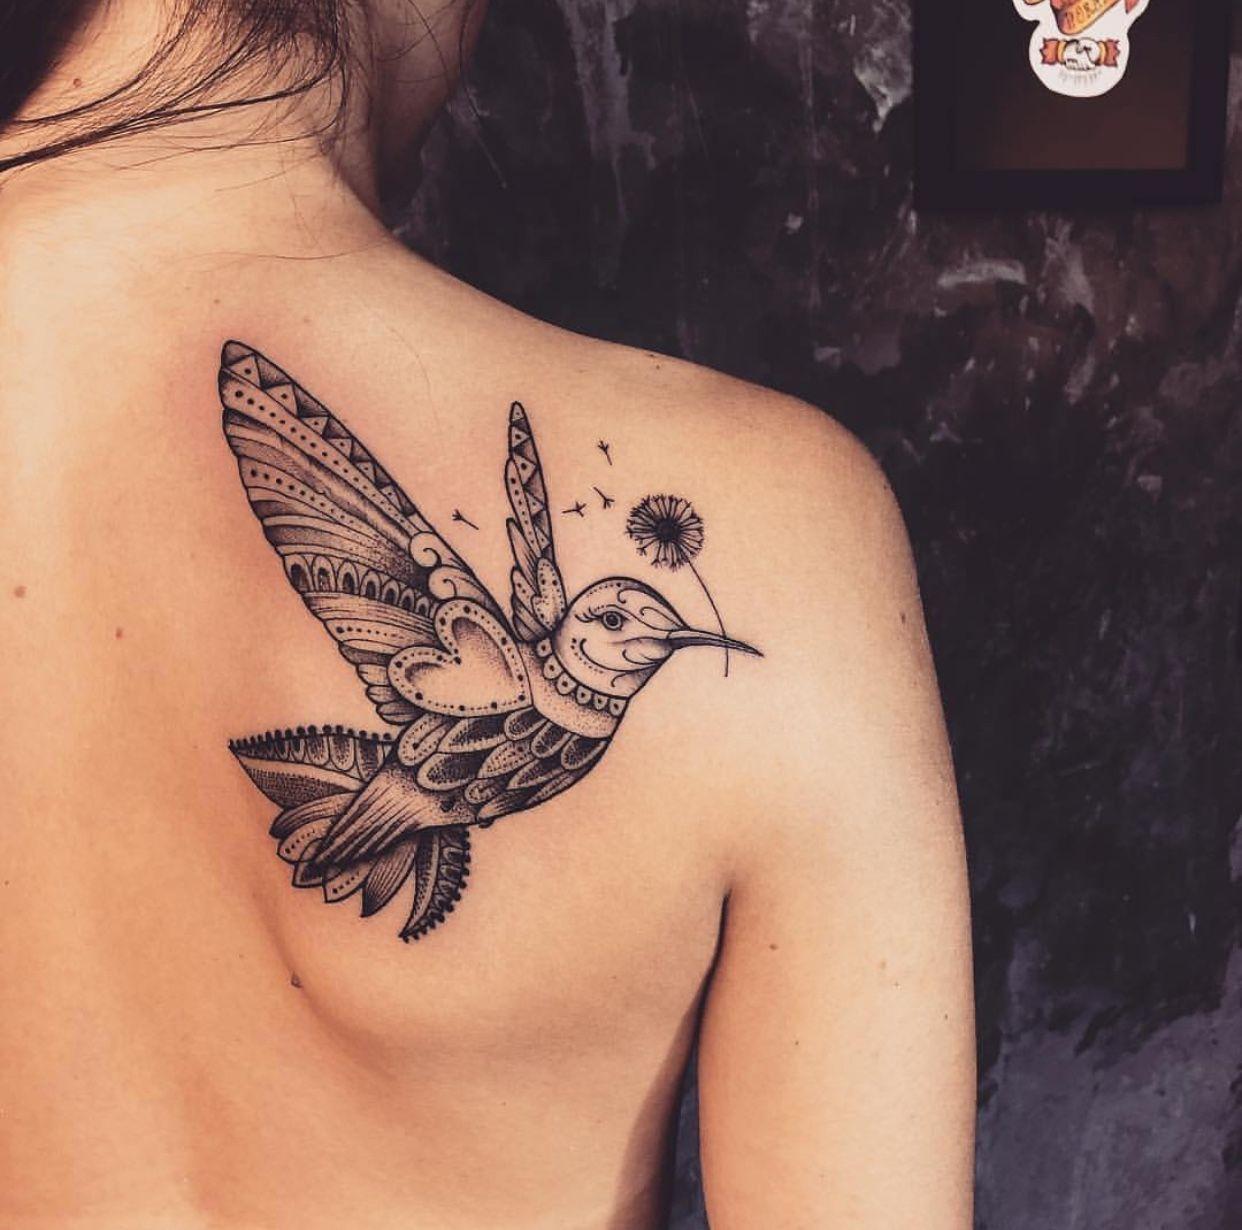 beija-flor tatuado nas costas